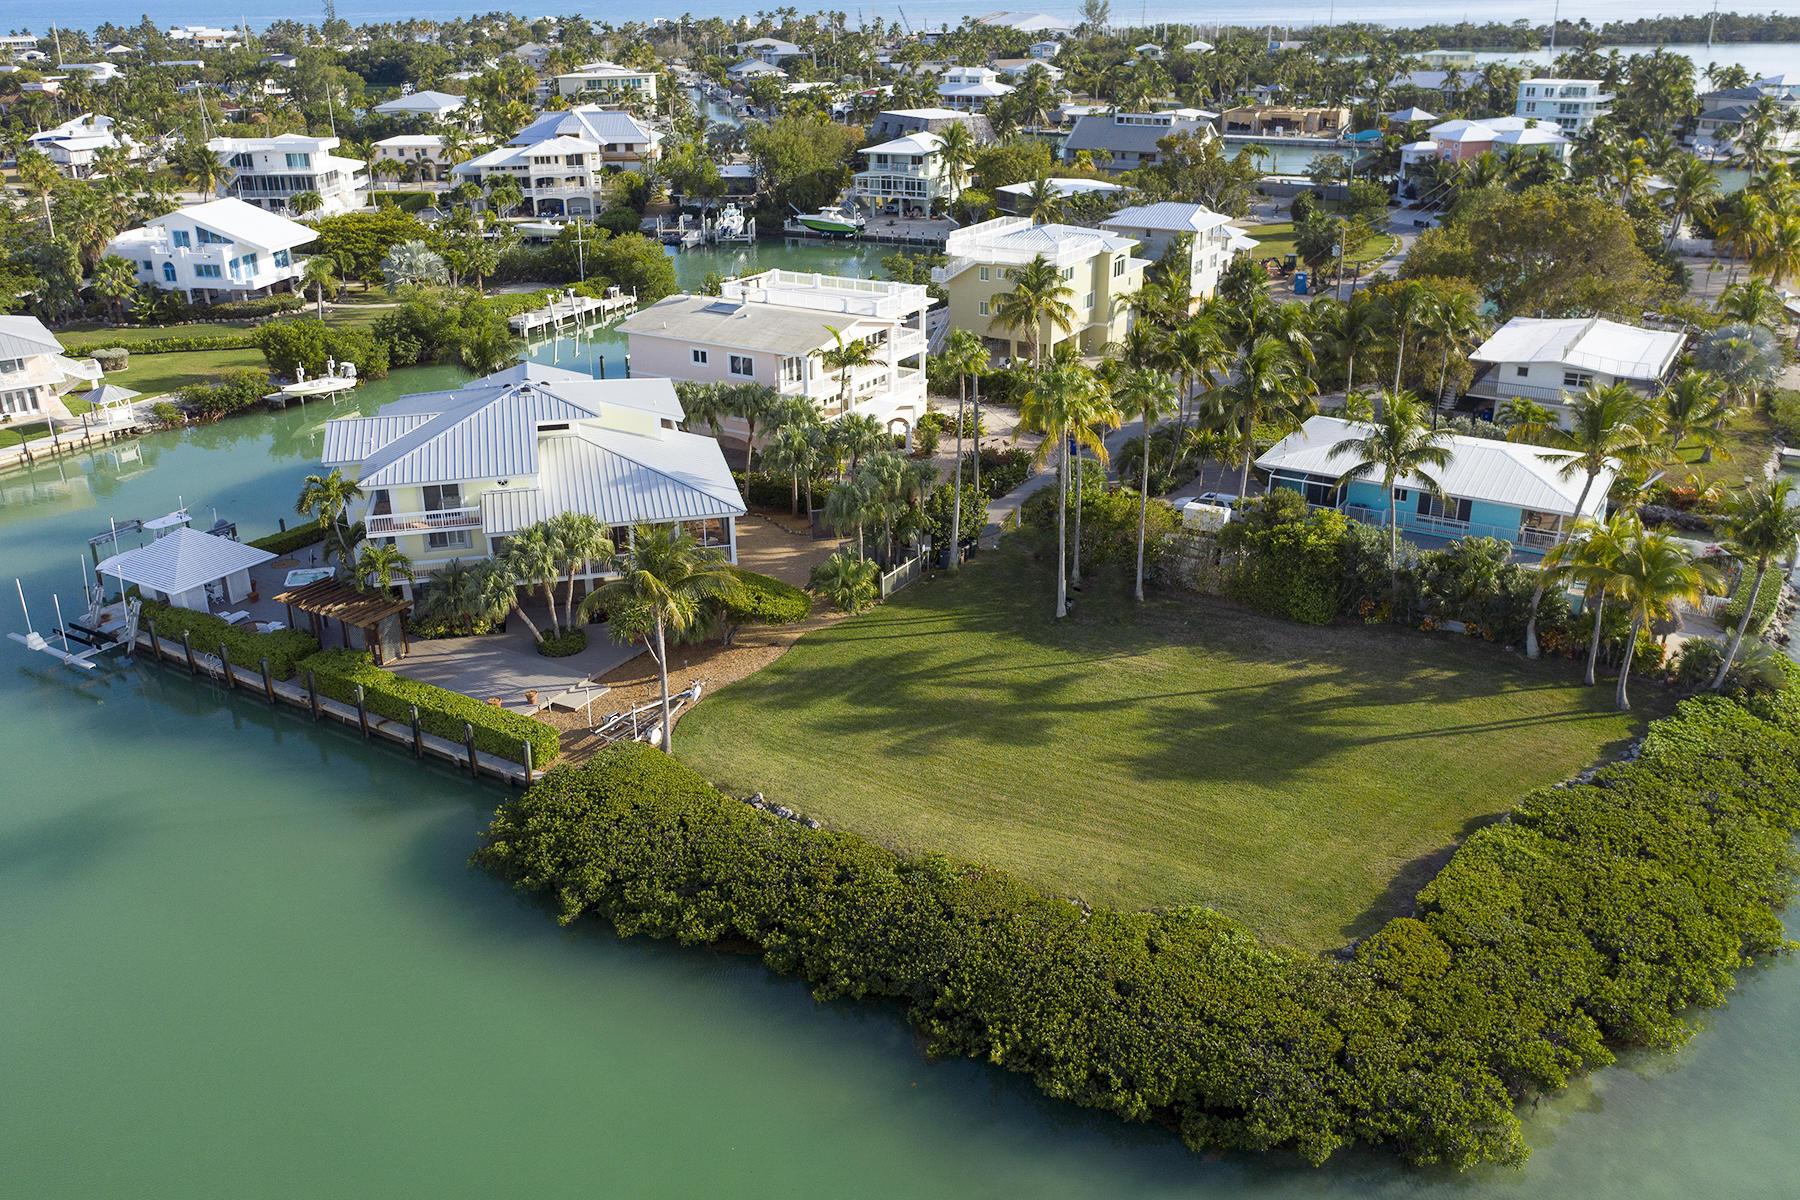 Single Family Homes für Verkauf beim 165 Bayview Drive, Islamorada, FL Islamorada, Florida 33036 Vereinigte Staaten